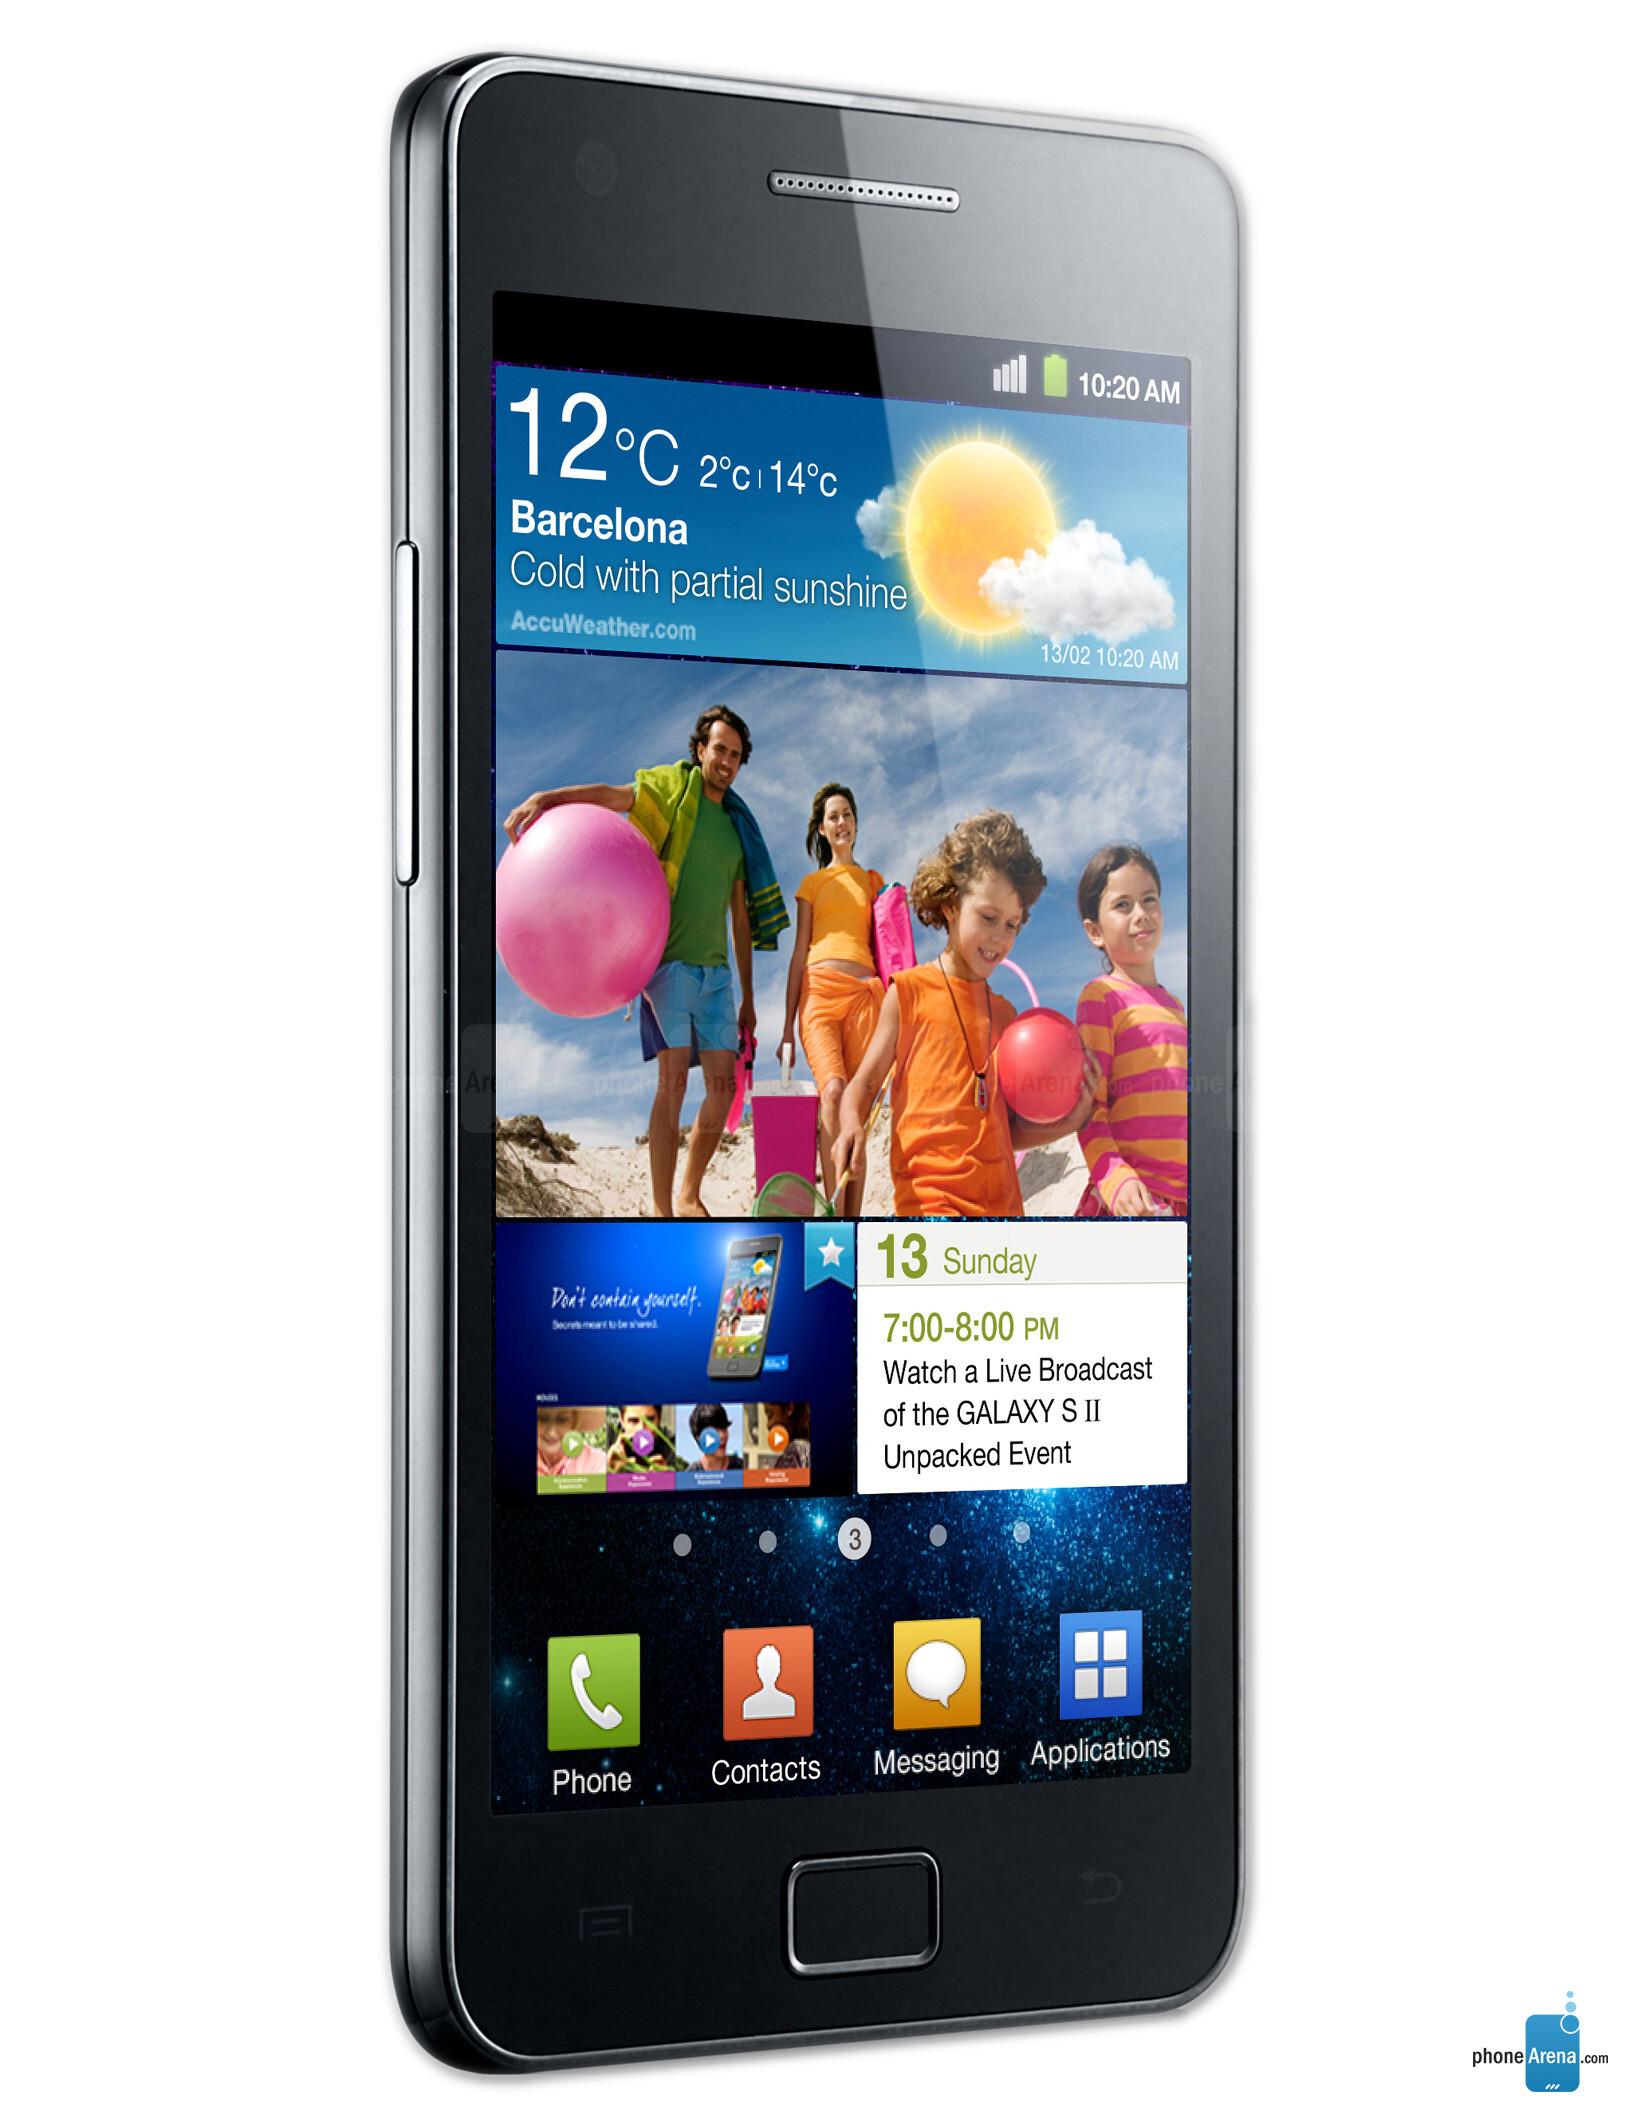 LG cheap phone cases for lg g2 : Samsung Galaxy S2 Black Boost Samsung galaxy s ii u00b7 view all